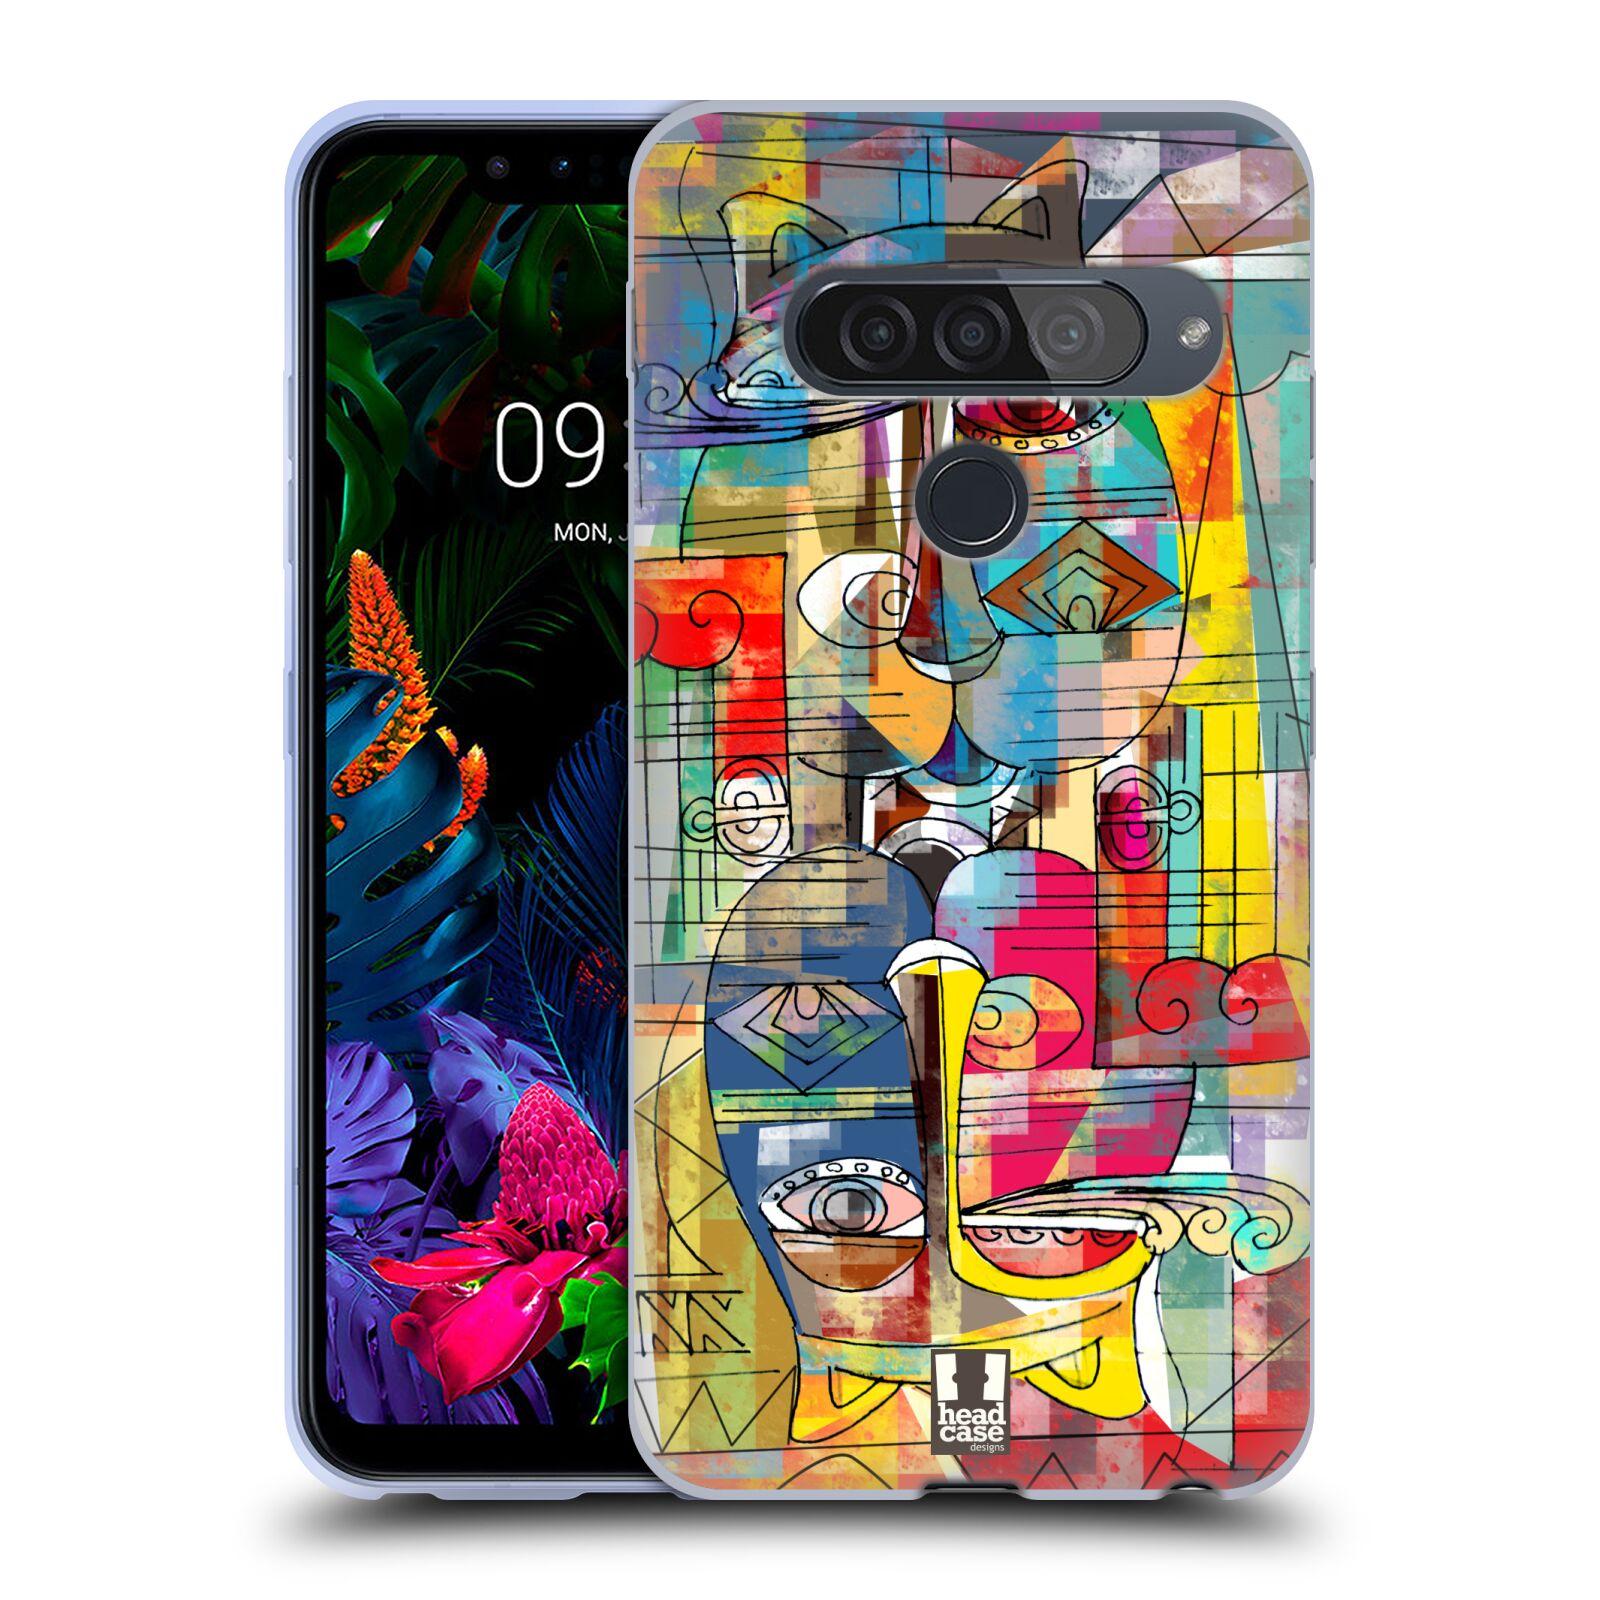 Silikonové pouzdro na mobil LG G8s ThinQ - Head Case - AZTEC MANX